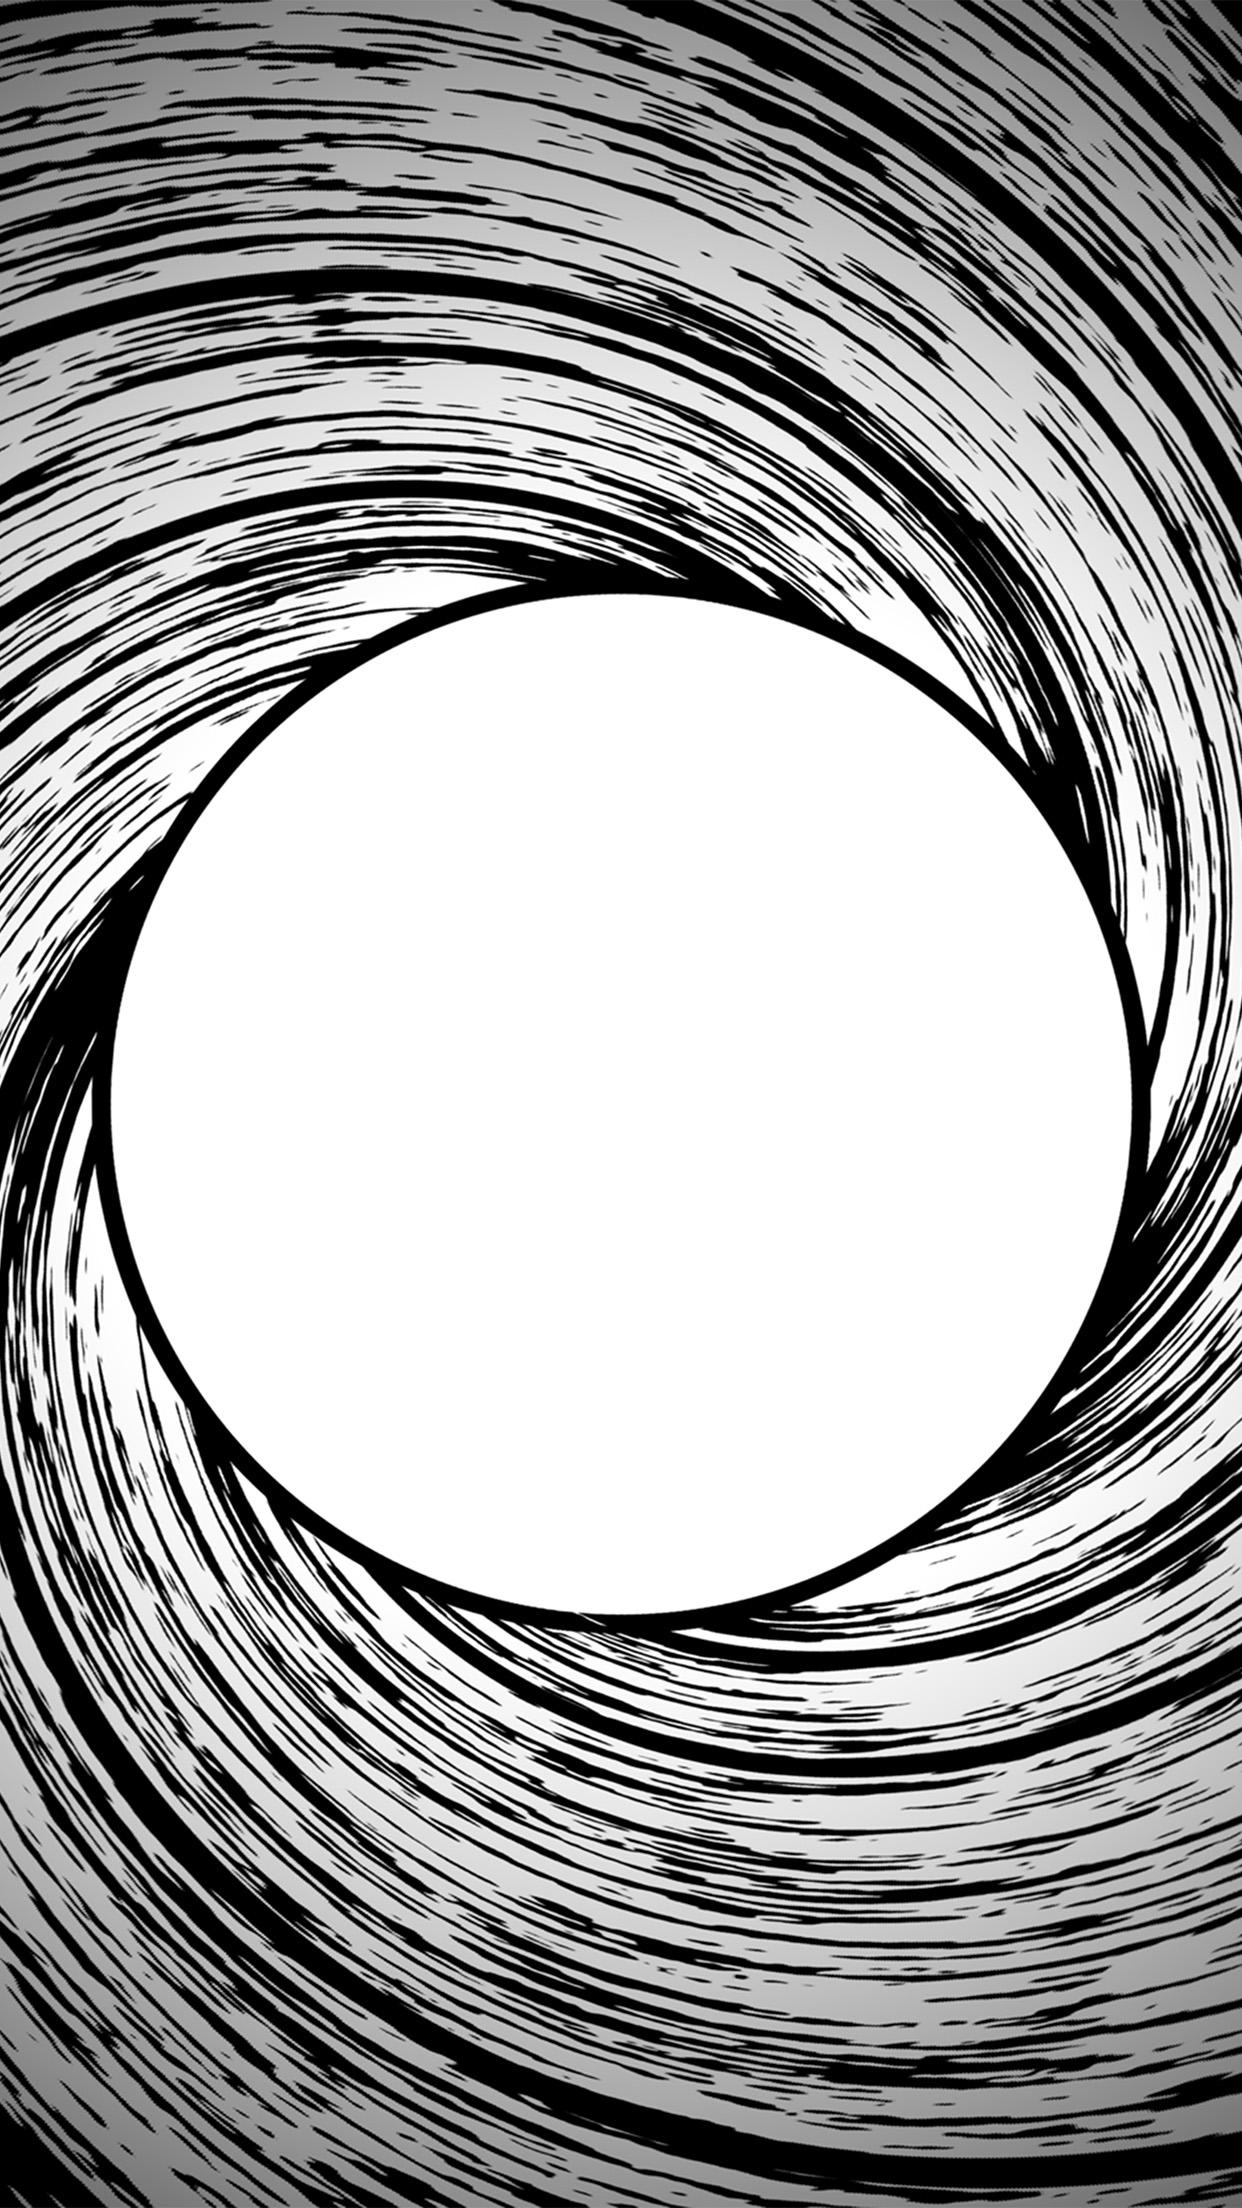 Vm95 james bond circle bw pattern wallpaper - James bond wallpaper iphone 5 ...